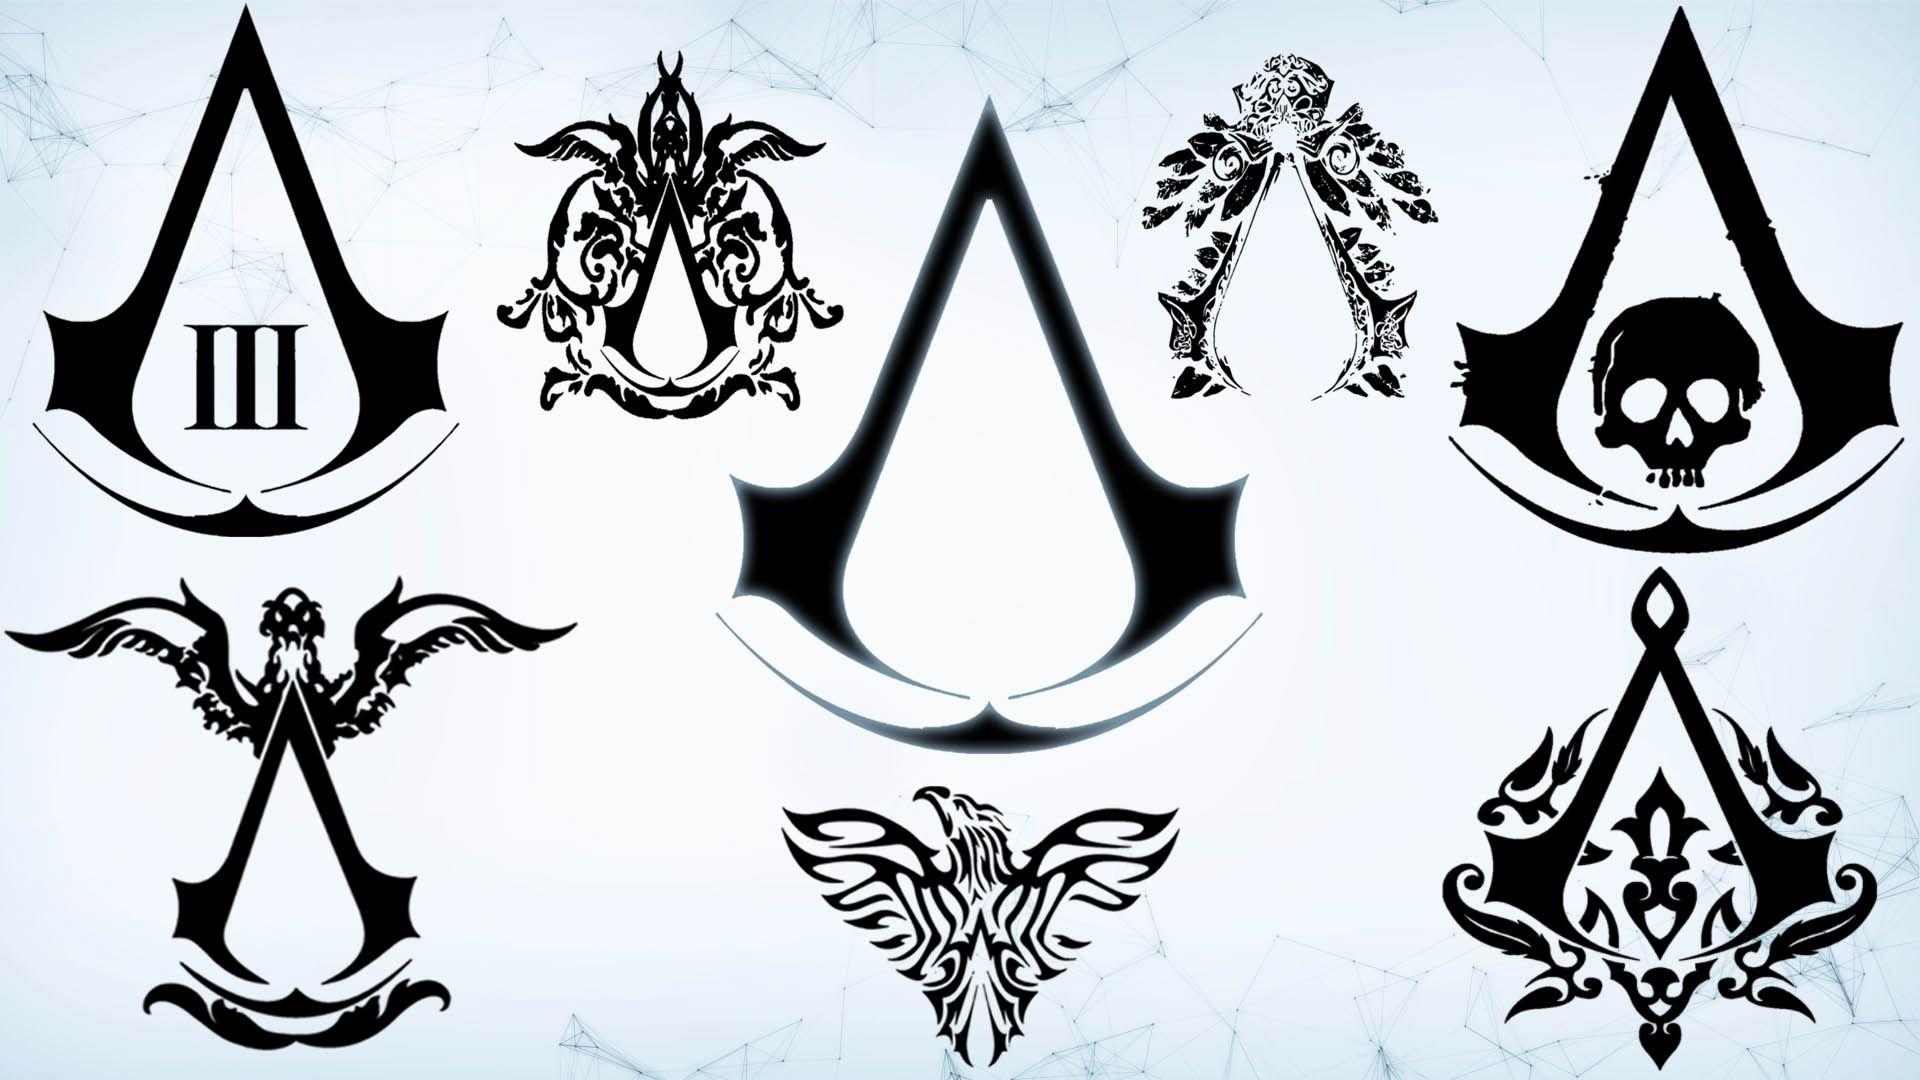 AC Odyssey black logo Assassins creed tattoo, Assassins